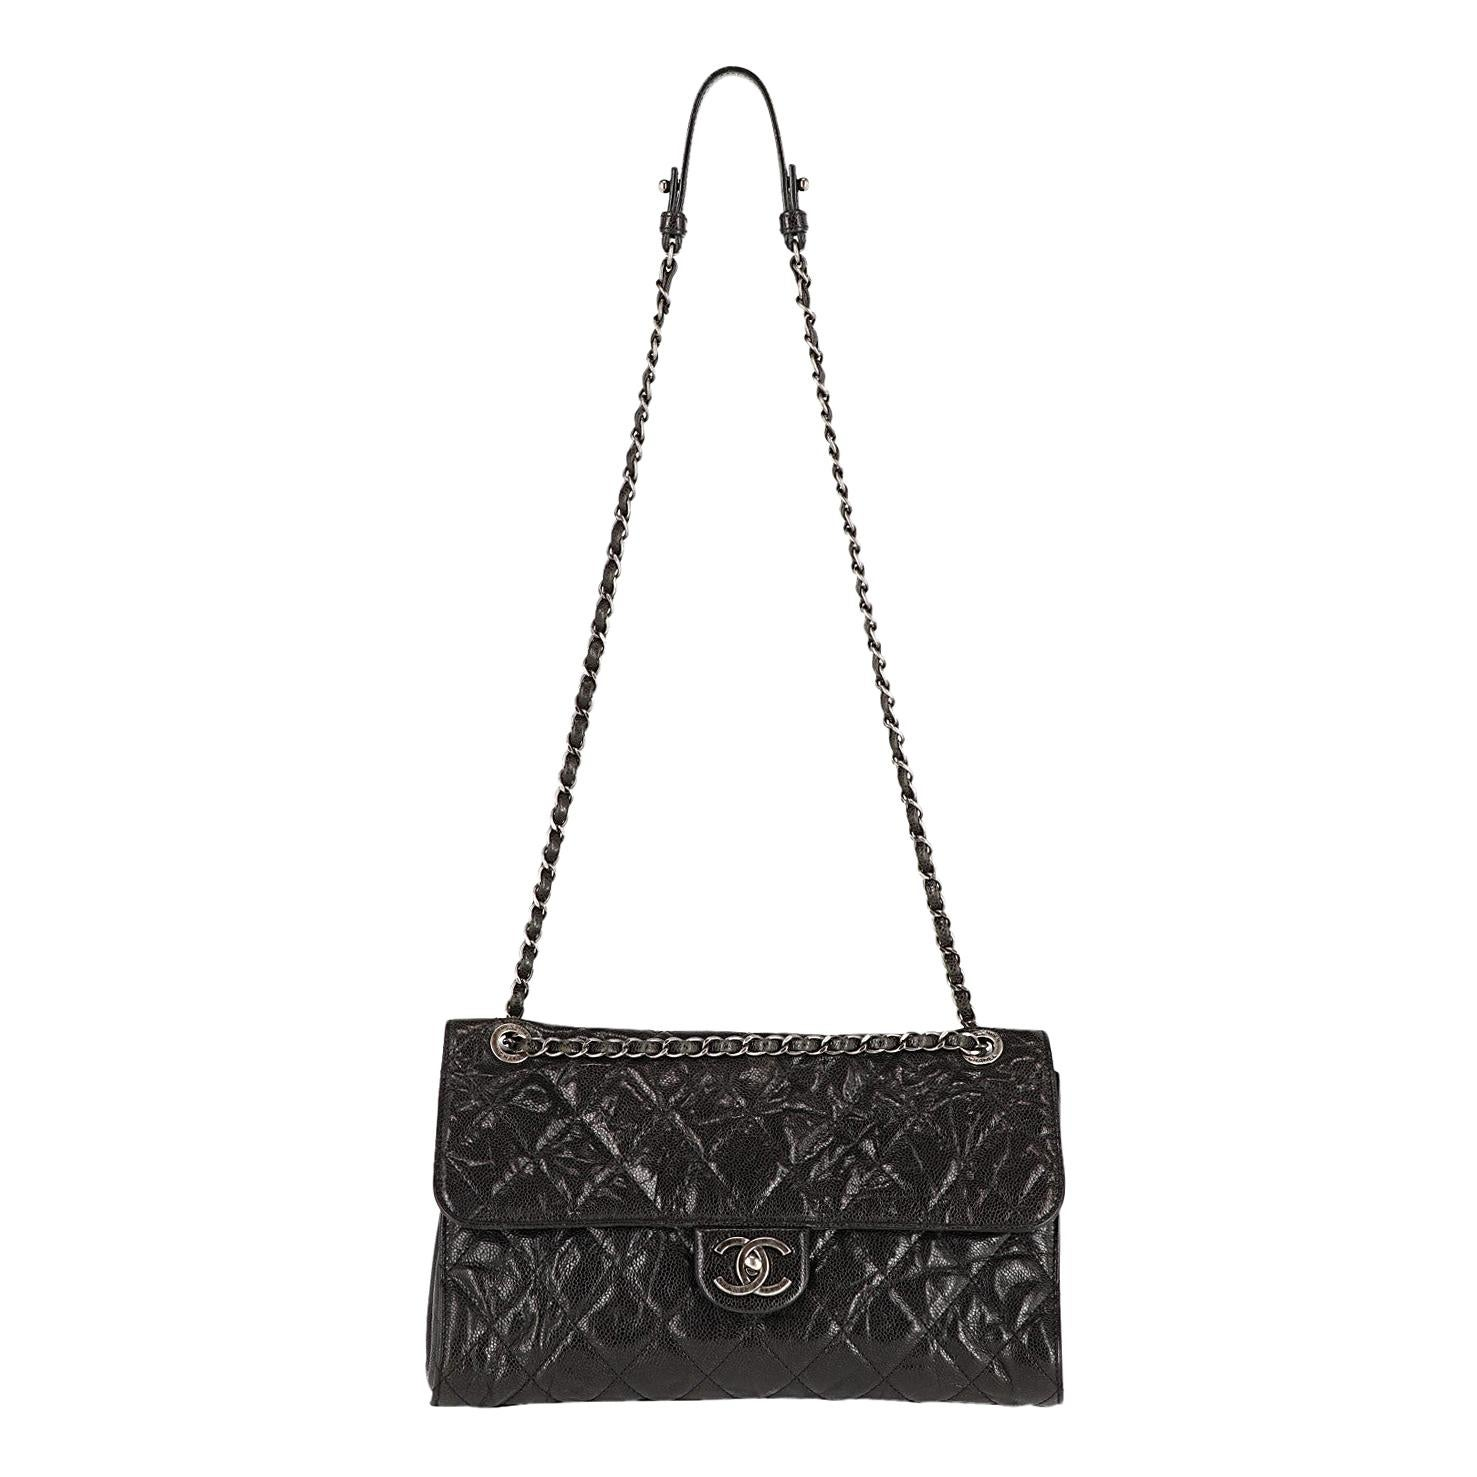 fd7e4c0f3b90 Vintage Chanel Purses and Handbags at 1stdibs